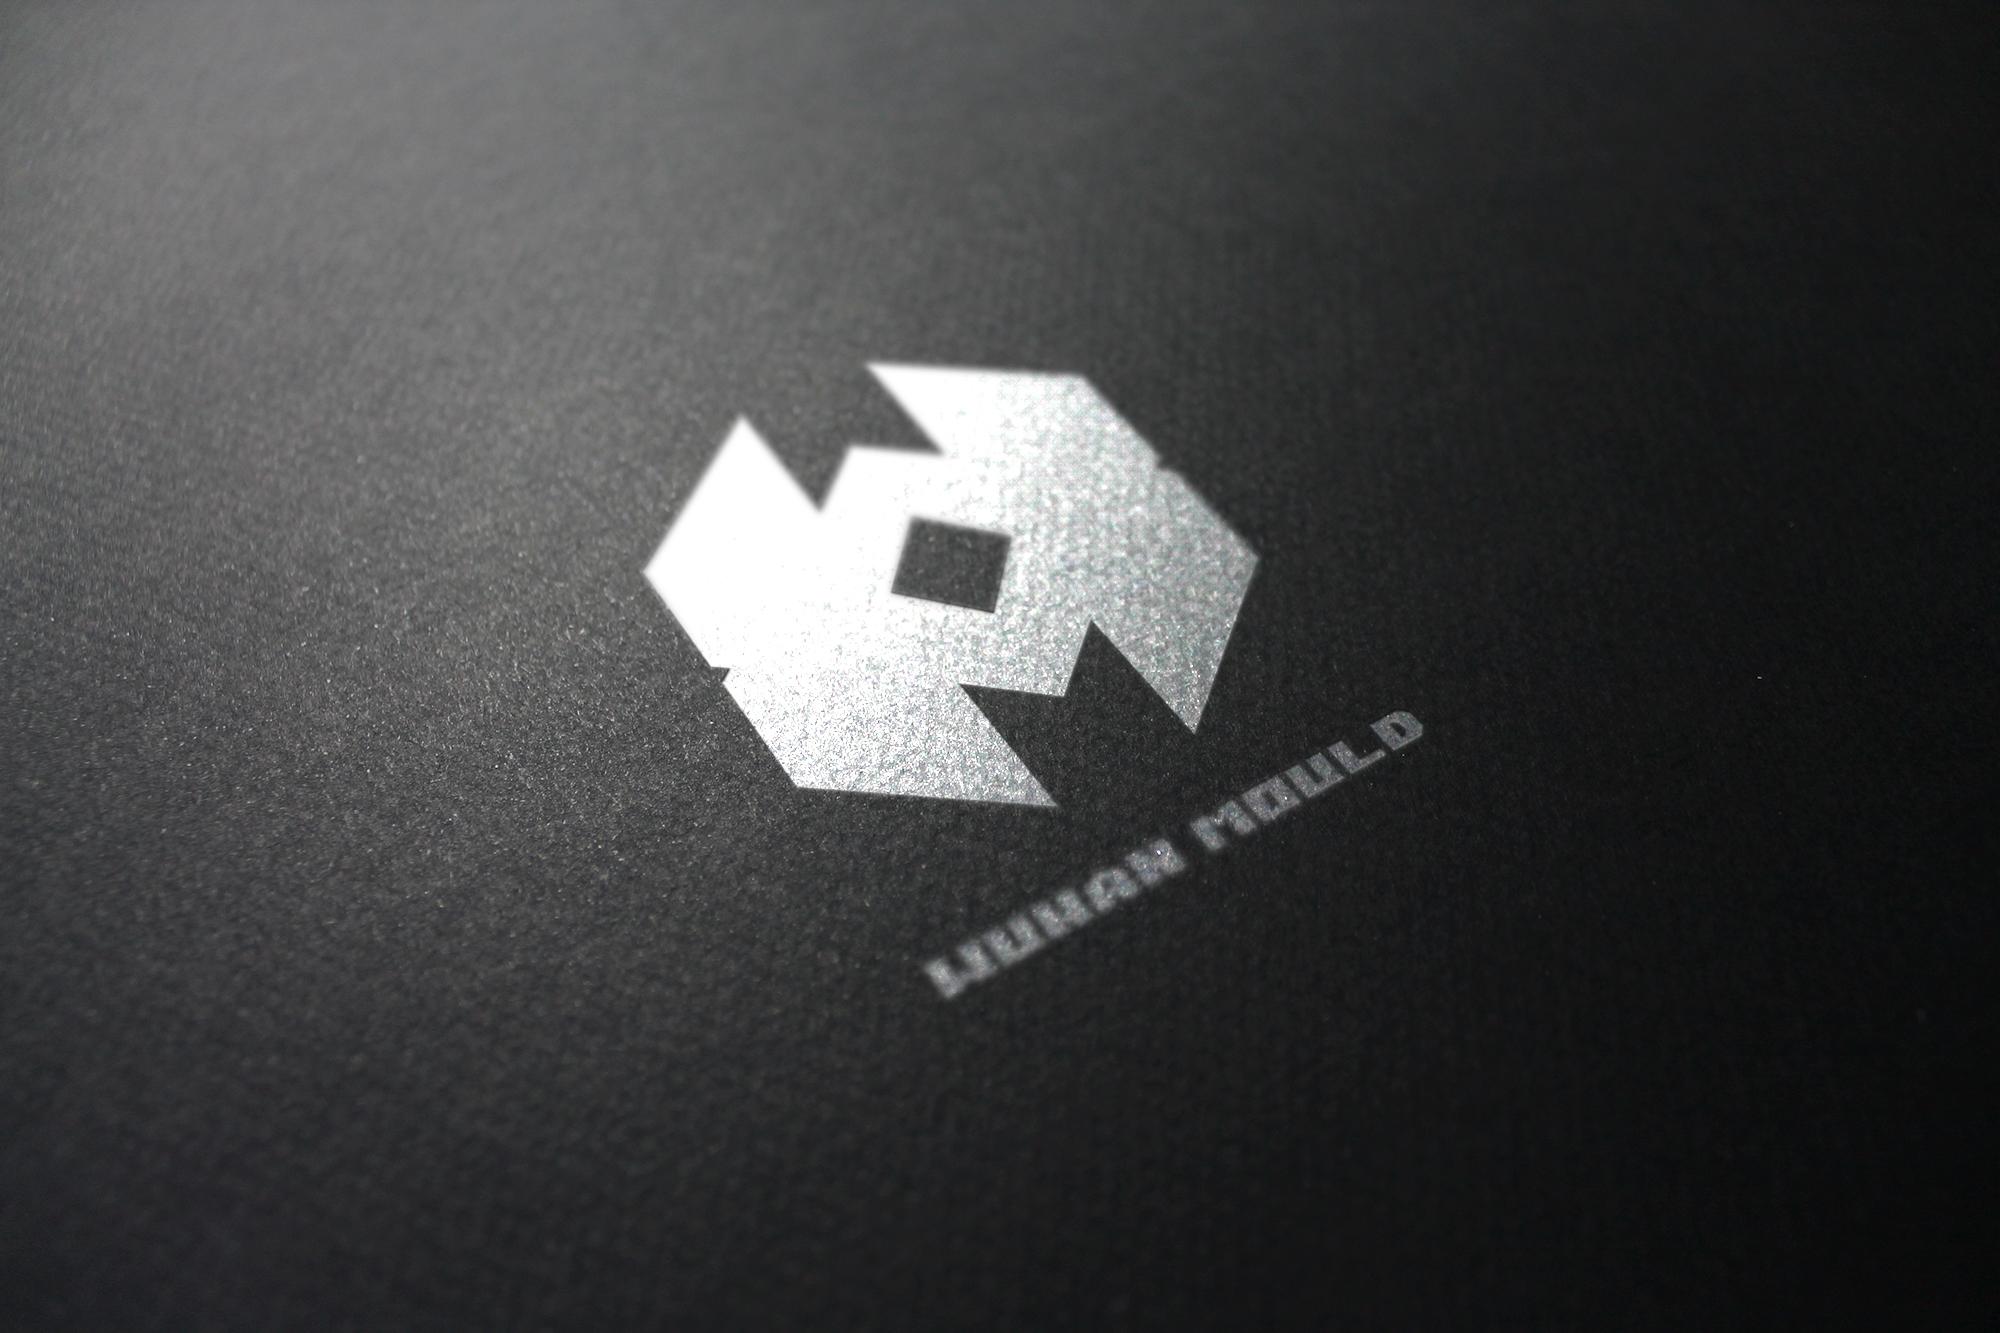 Создать логотип для фабрики пресс-форм фото f_7015991f9bace467.jpg